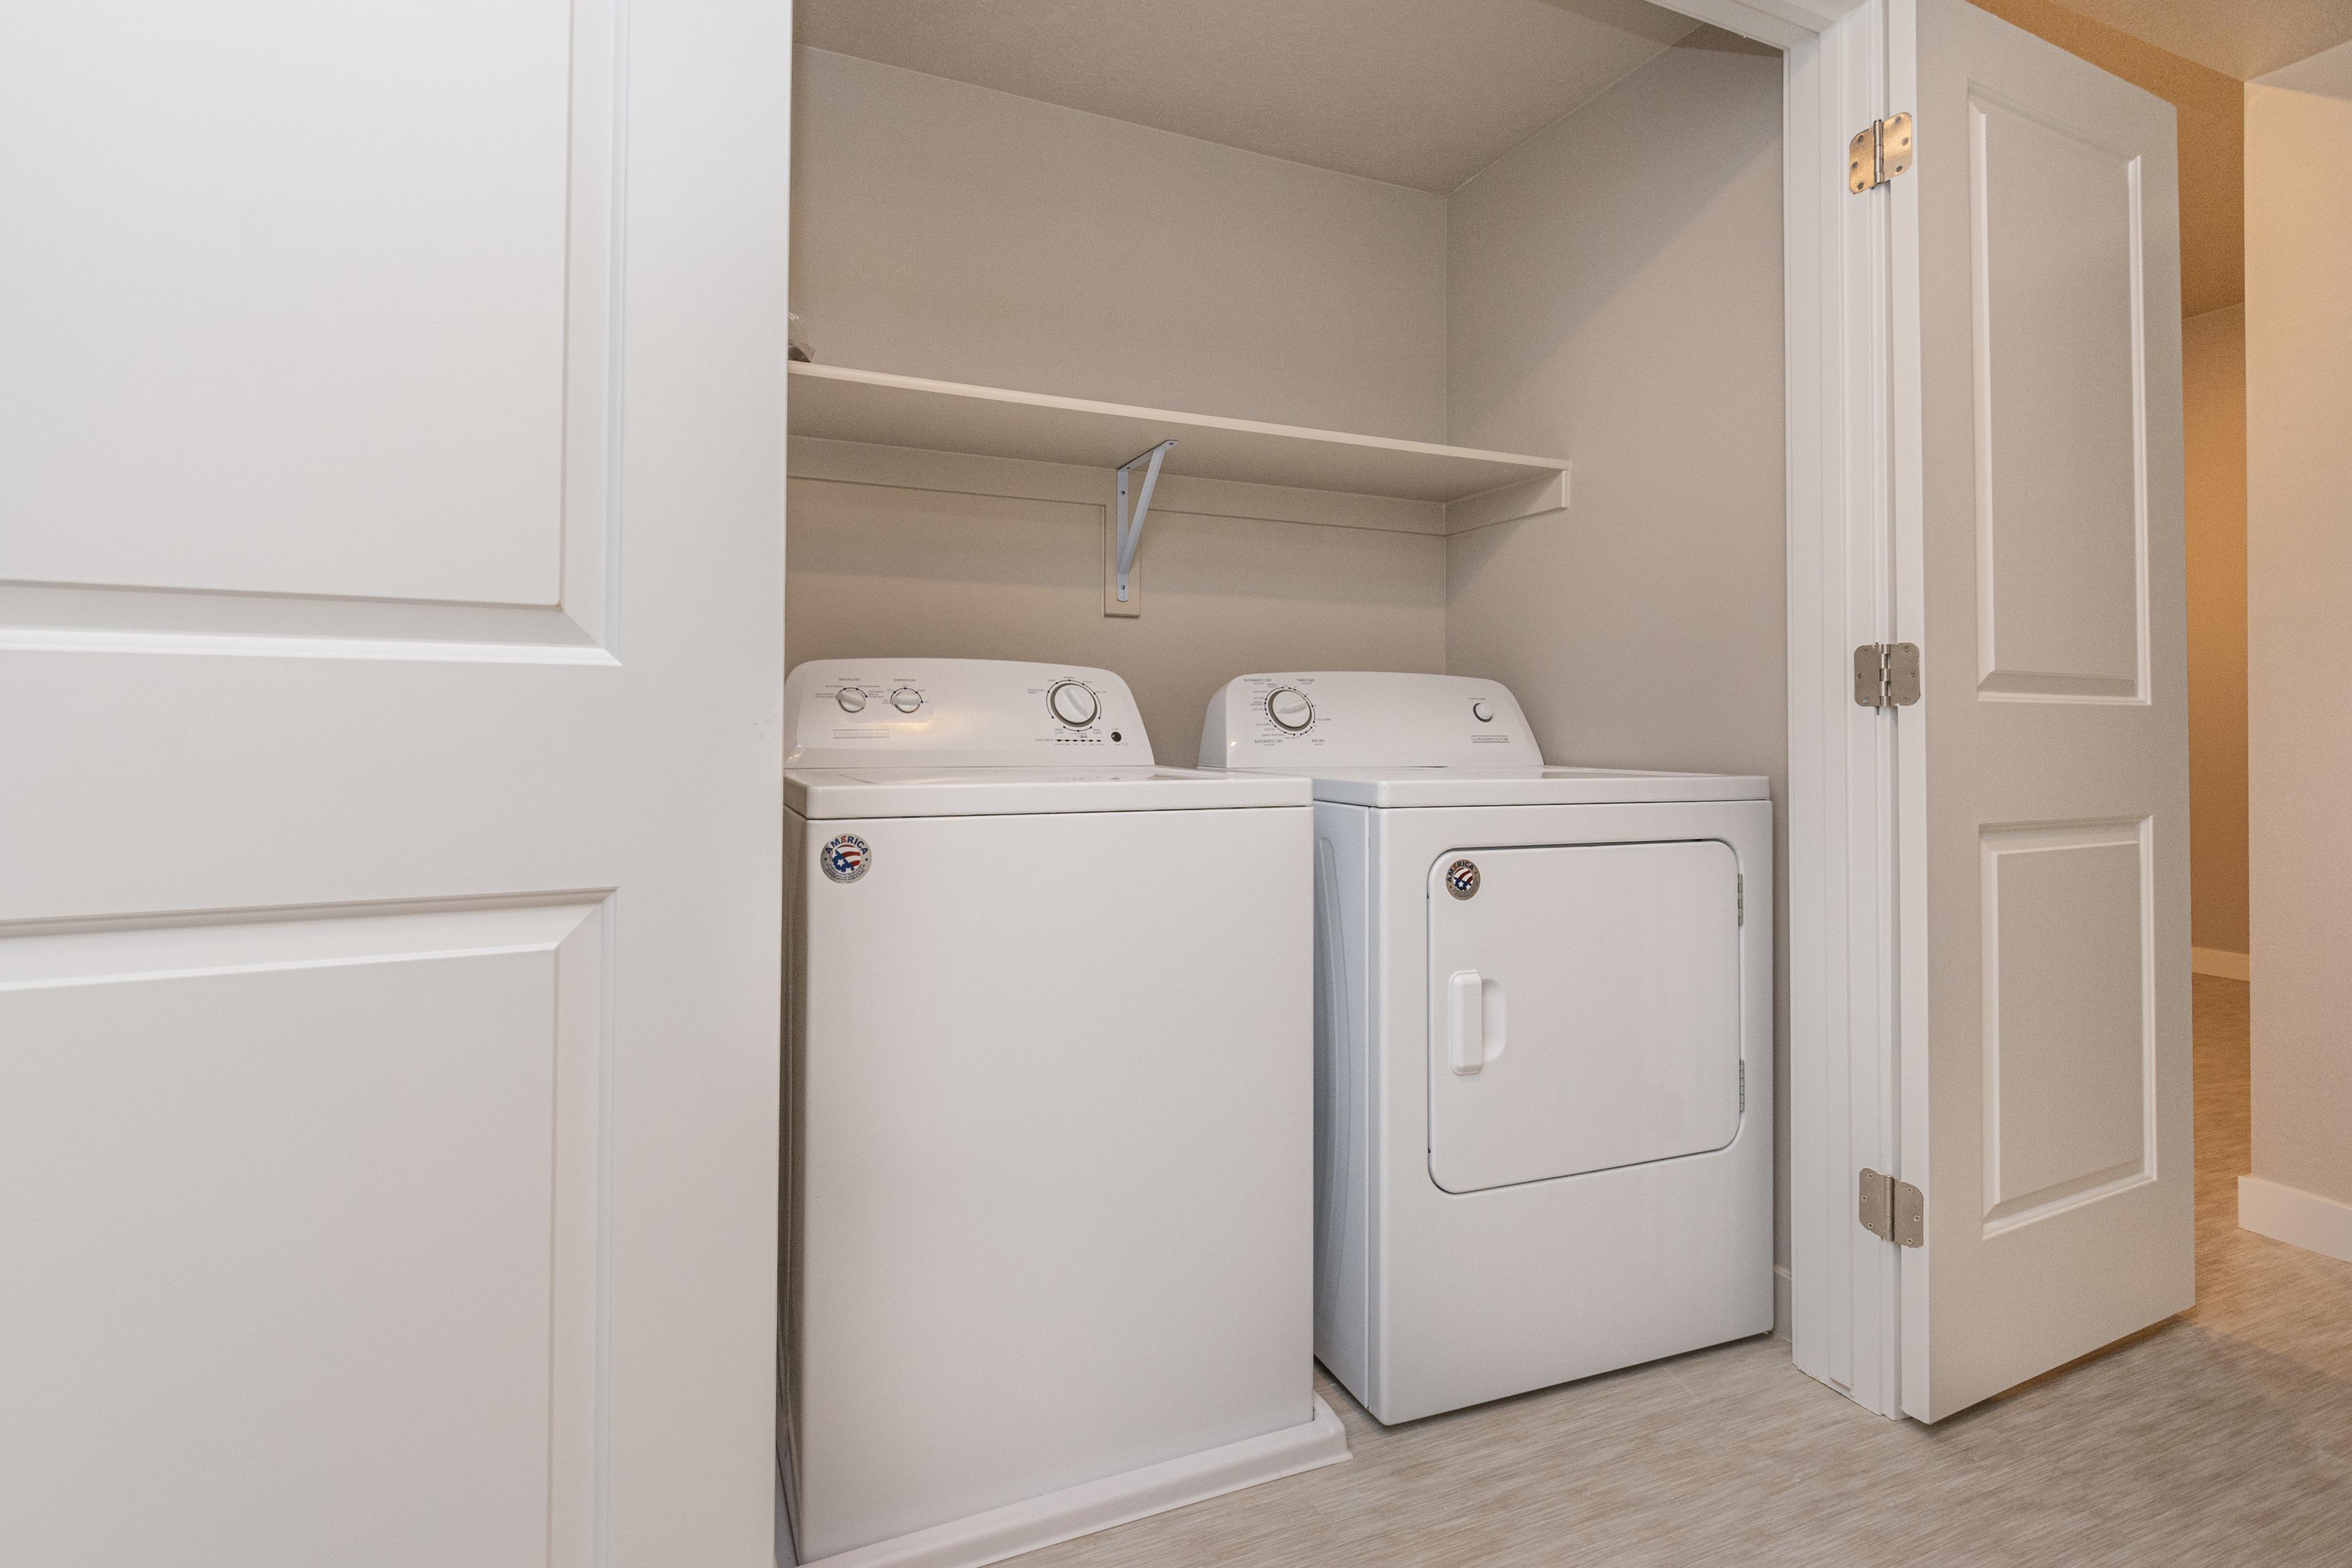 Building B Washer/Dryer